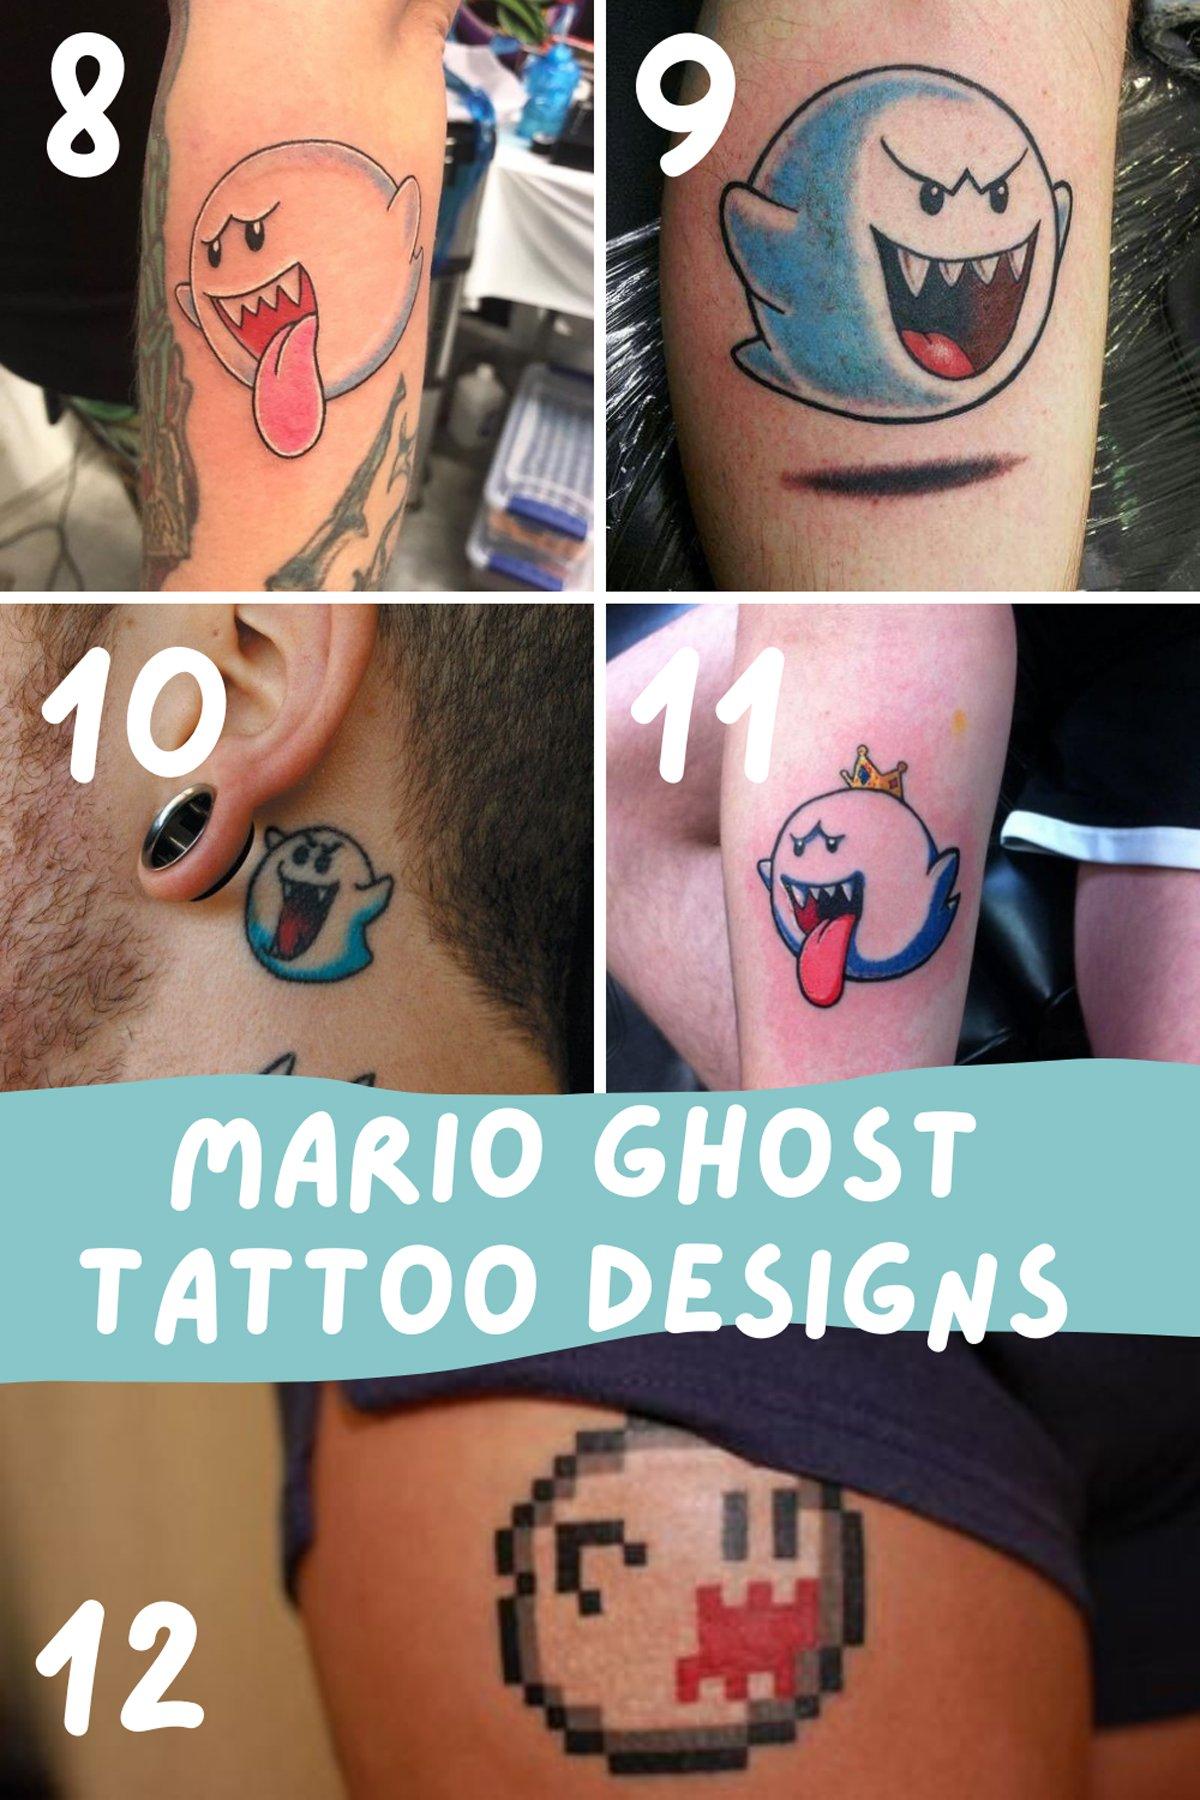 Mario Ghost Tattoo Designs